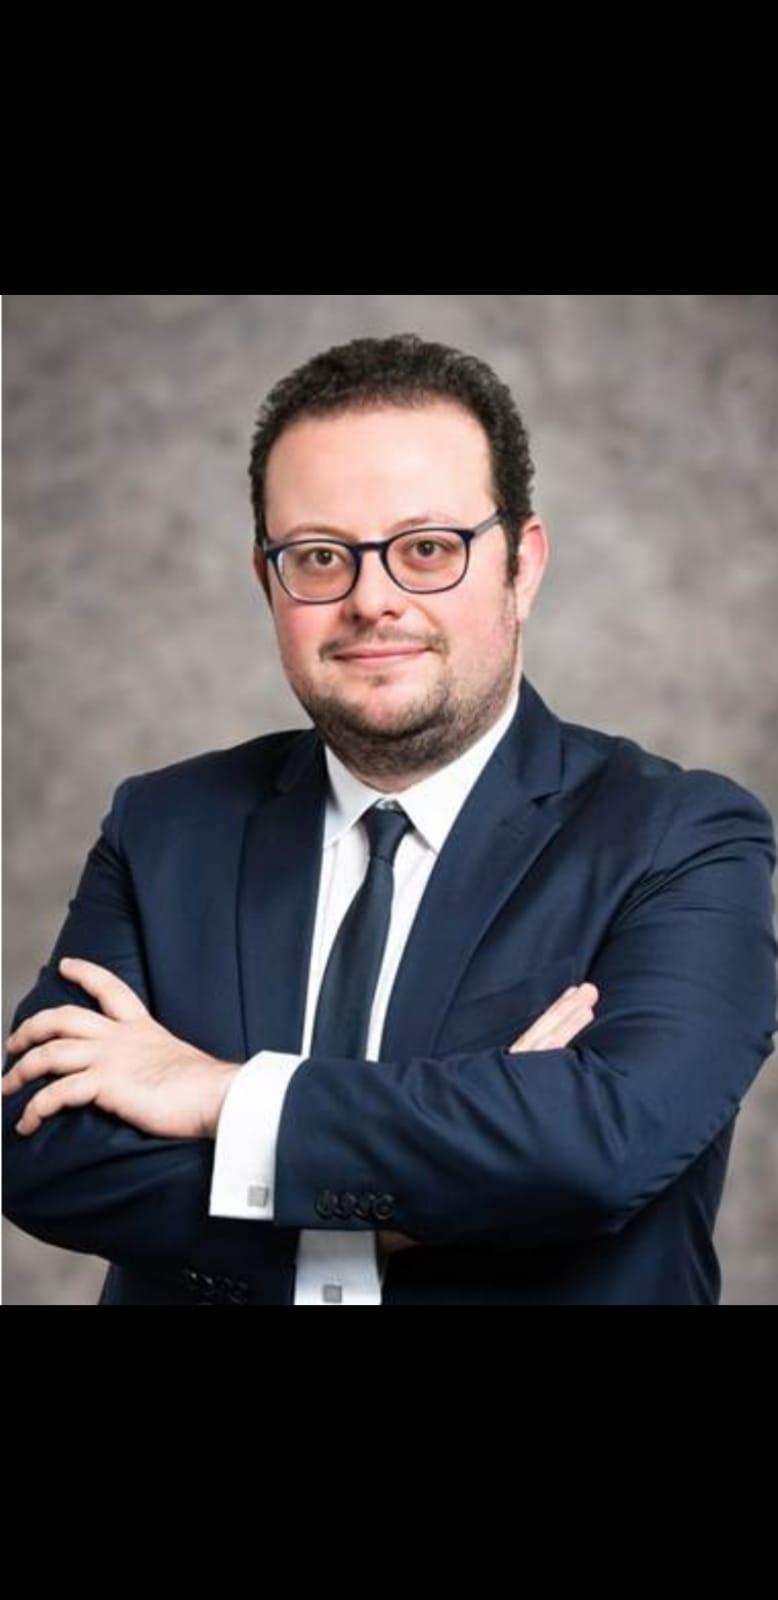 Ralph Moughanie- Noe BGS's new Board Member